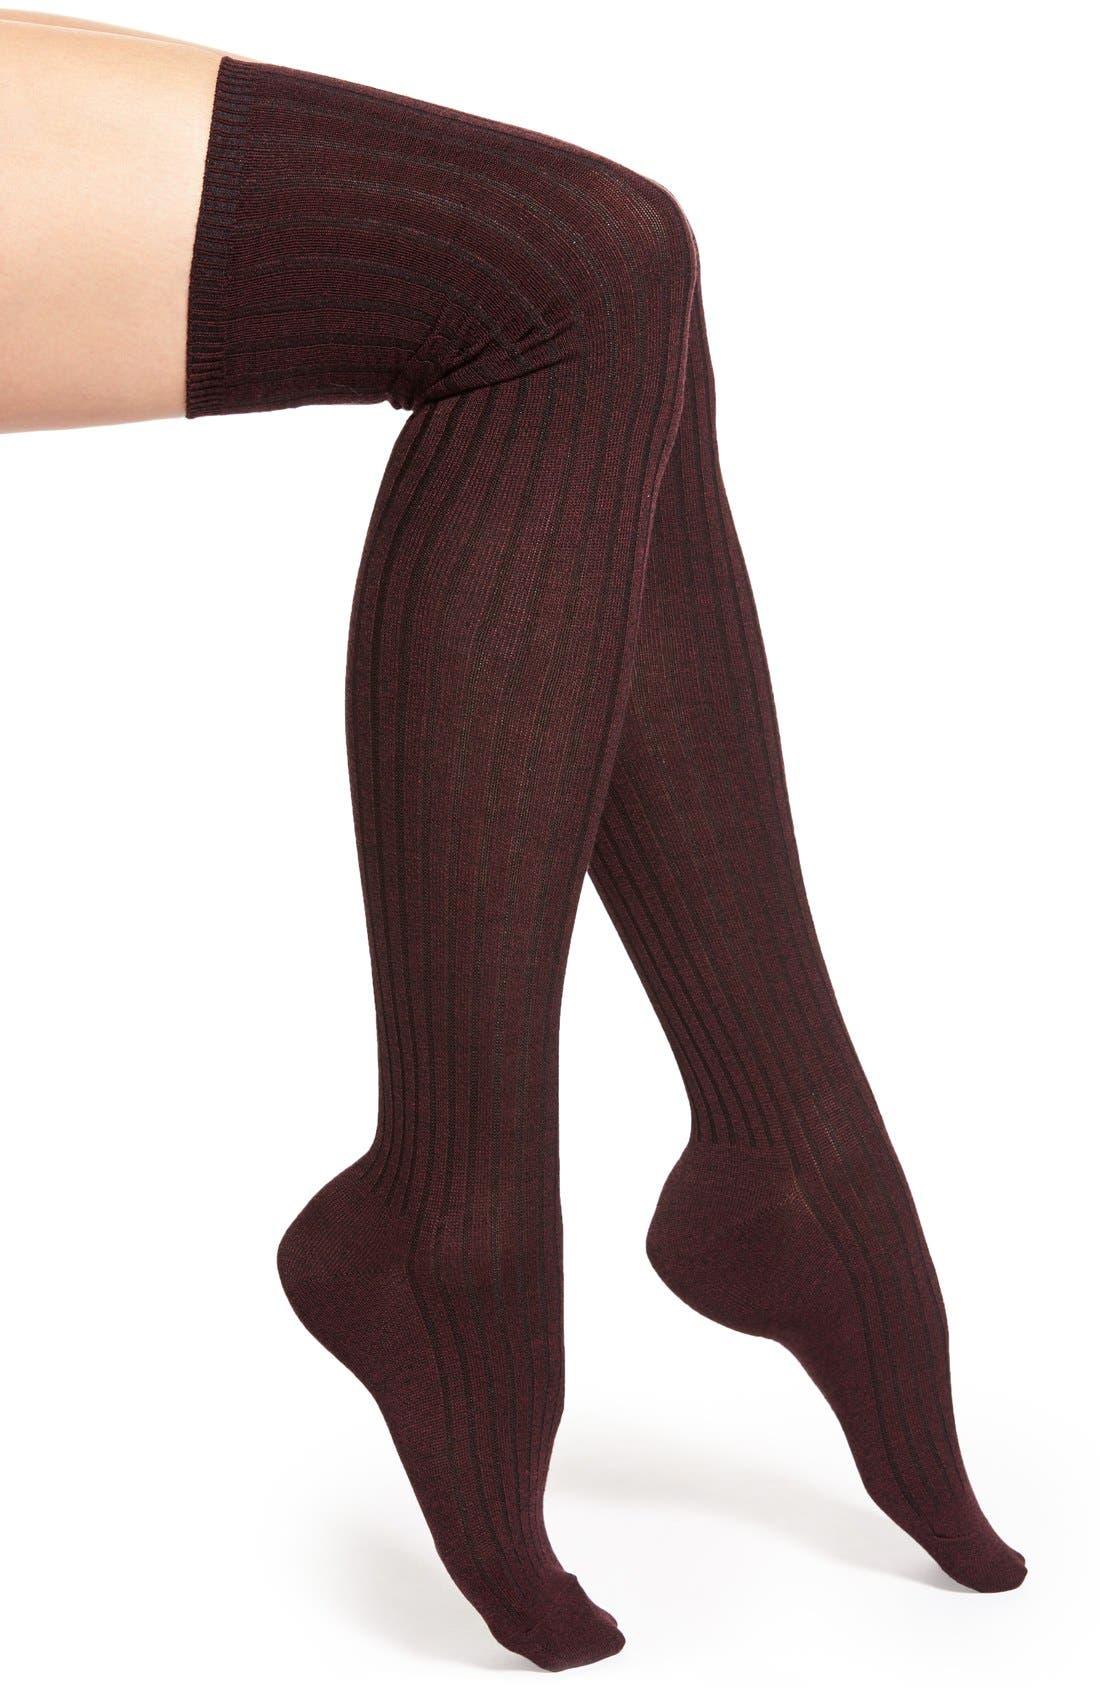 Main Image - Hue Marled Rib Knit Over the Knee Socks